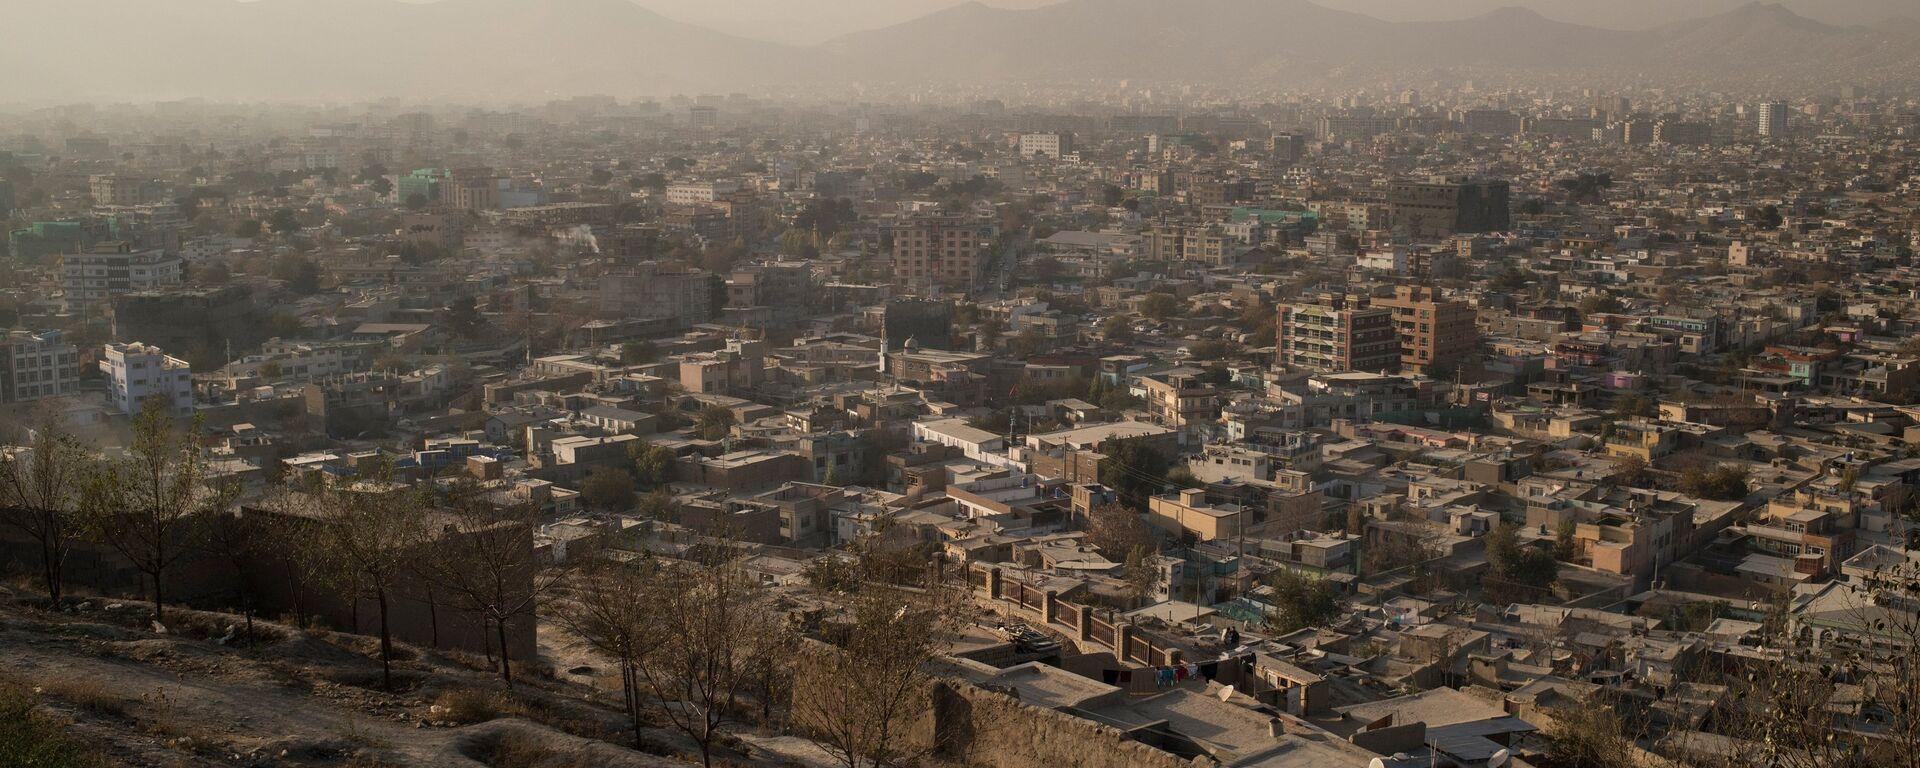 Вид на город Кабул в Афганистане - Sputnik Тоҷикистон, 1920, 08.08.2021